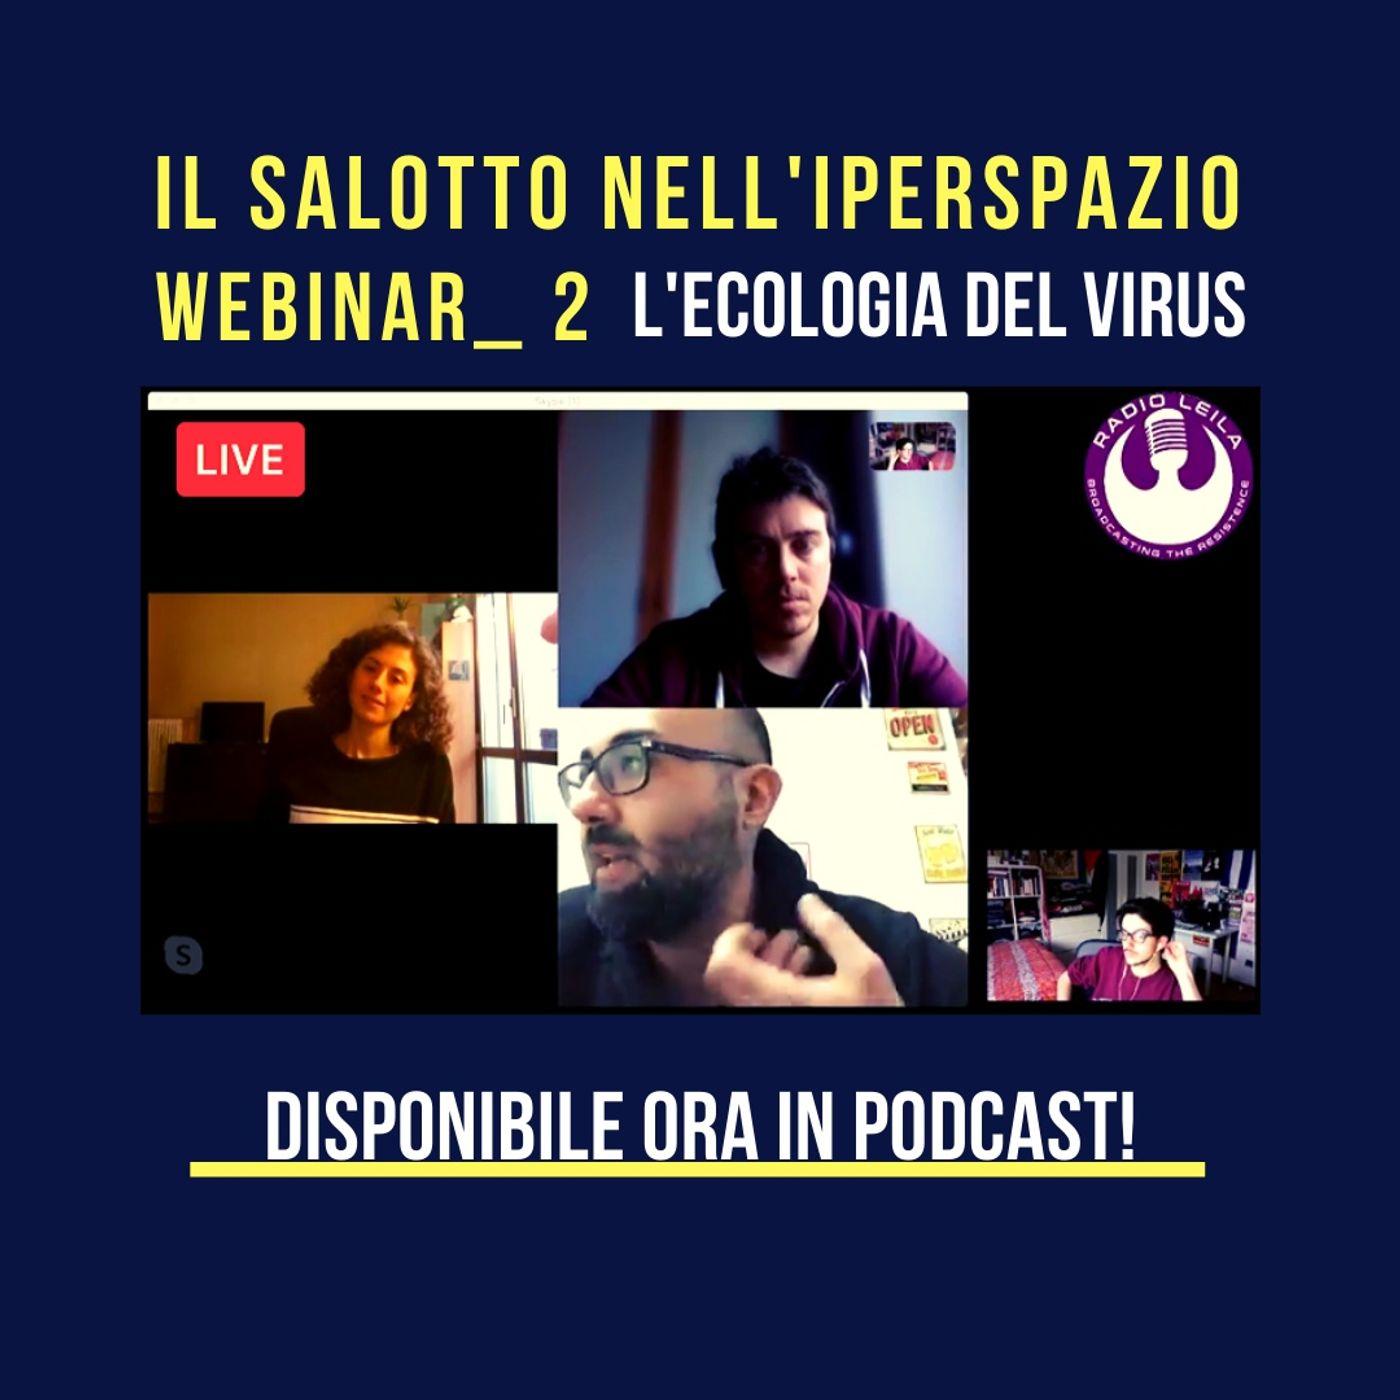 Webinar_2 L'Ecologia del Virus